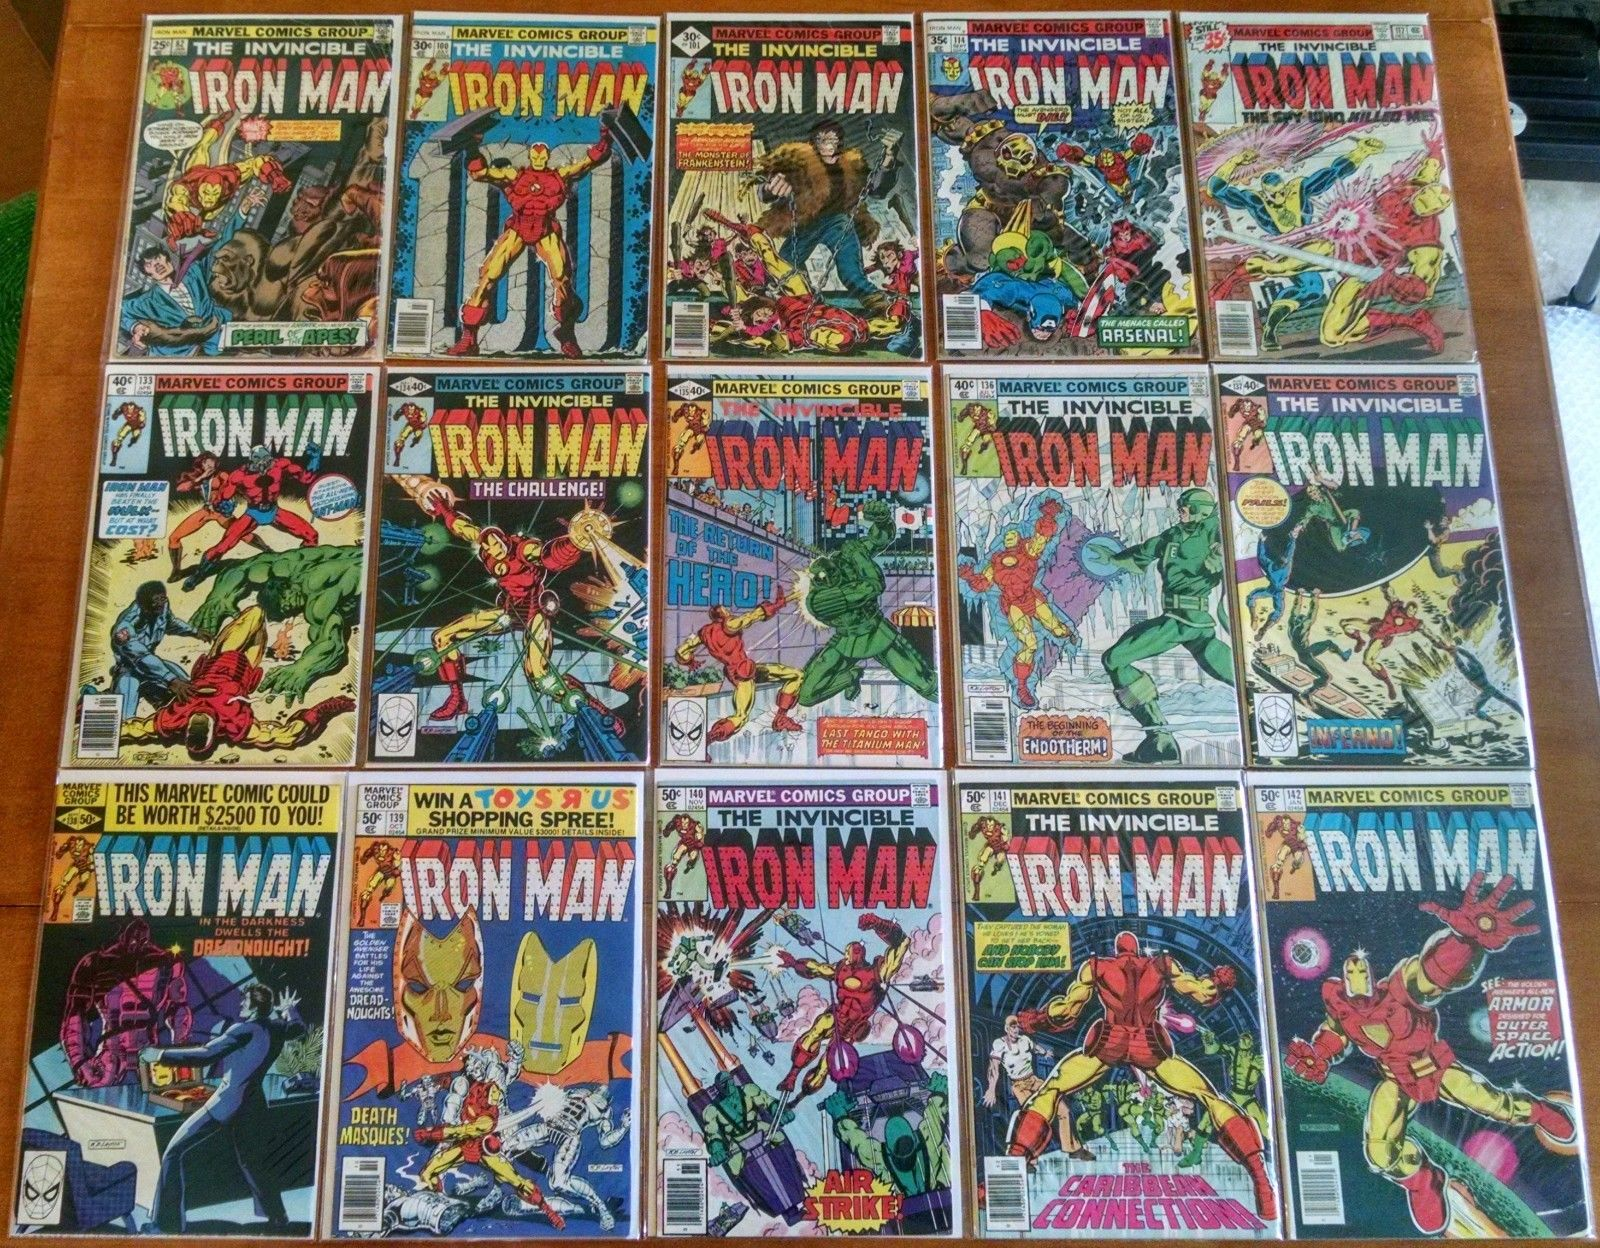 Iron Man (1968-1996) #100,101-150, 154-200,201-250,251-300 (155-Issue Set) 1-332